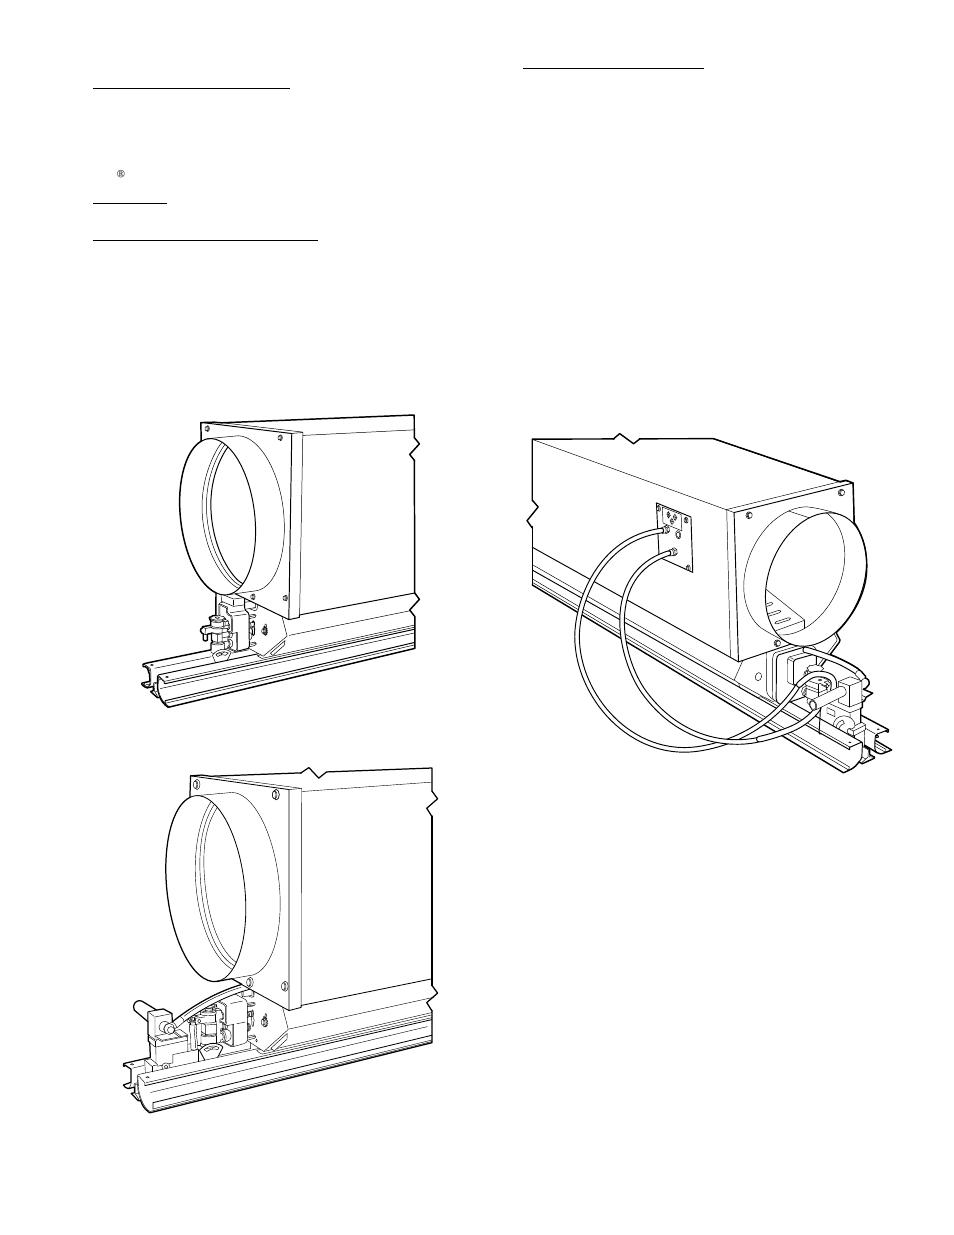 carrier moduline 37hs user manual page 47 84 original mode rh manualsdir com Cartoon Manual Service Manuals